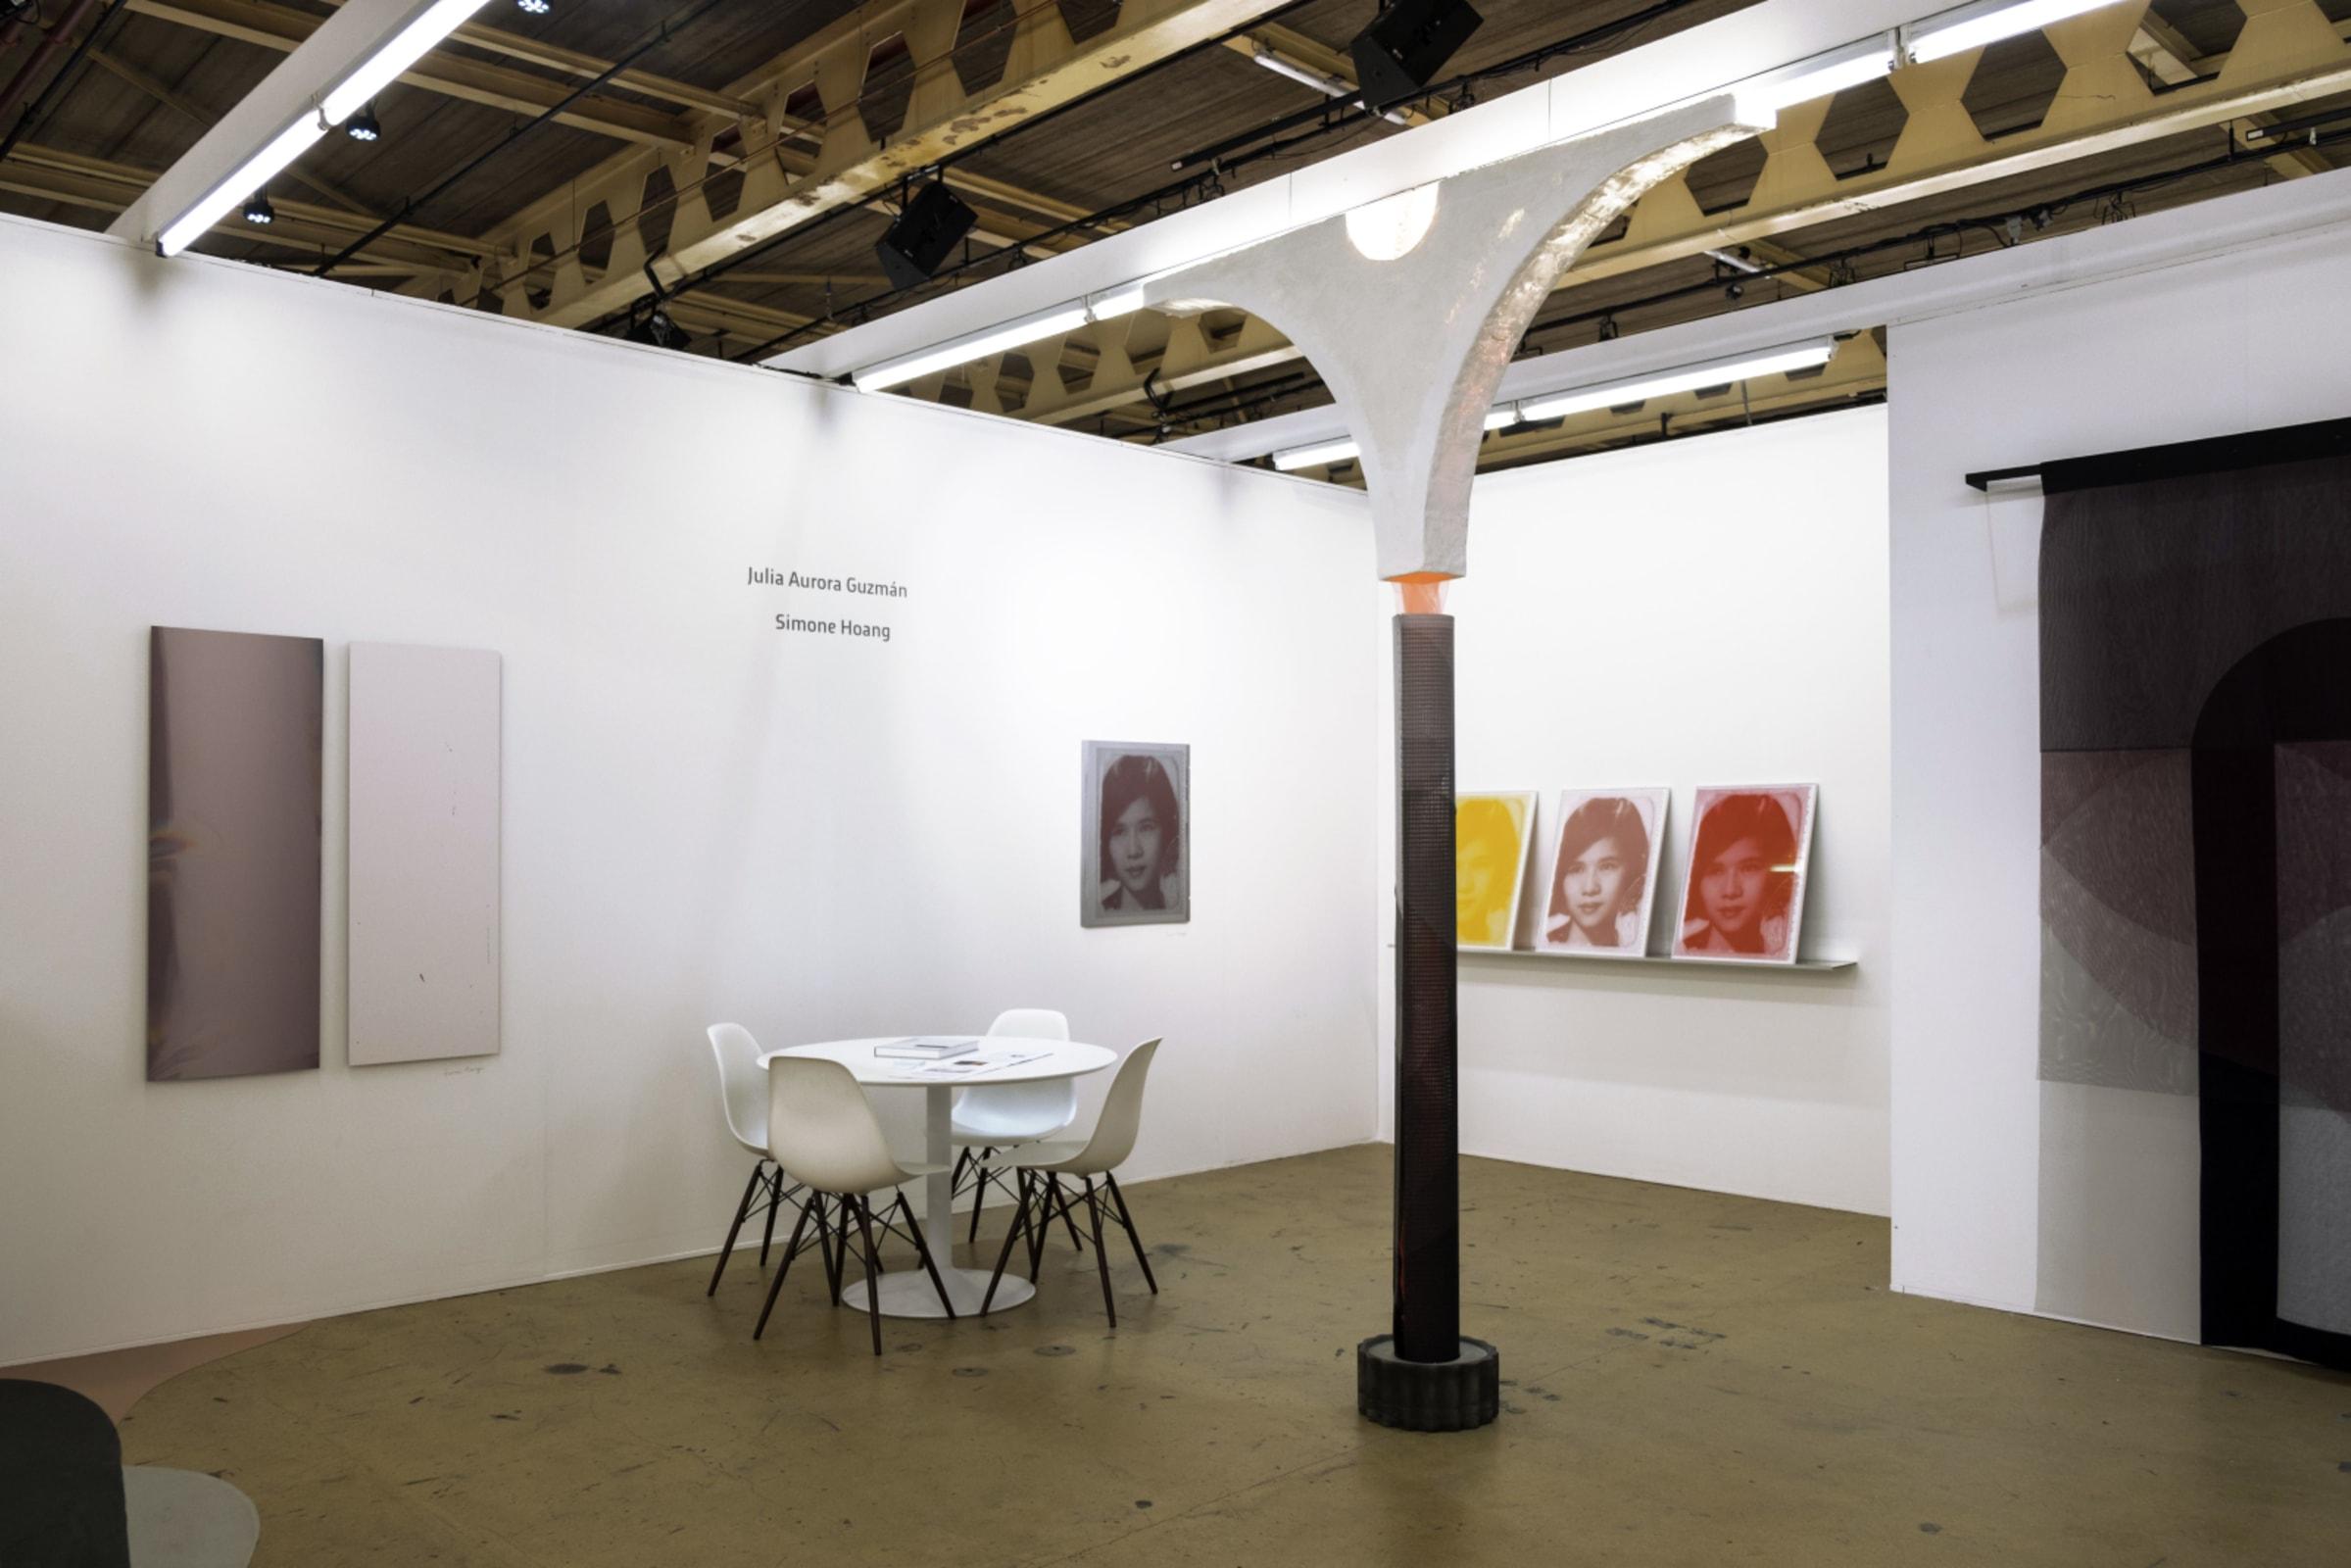 Art Rotterdam 2019, Simone Hoang, Julia Aurora Guzmán,